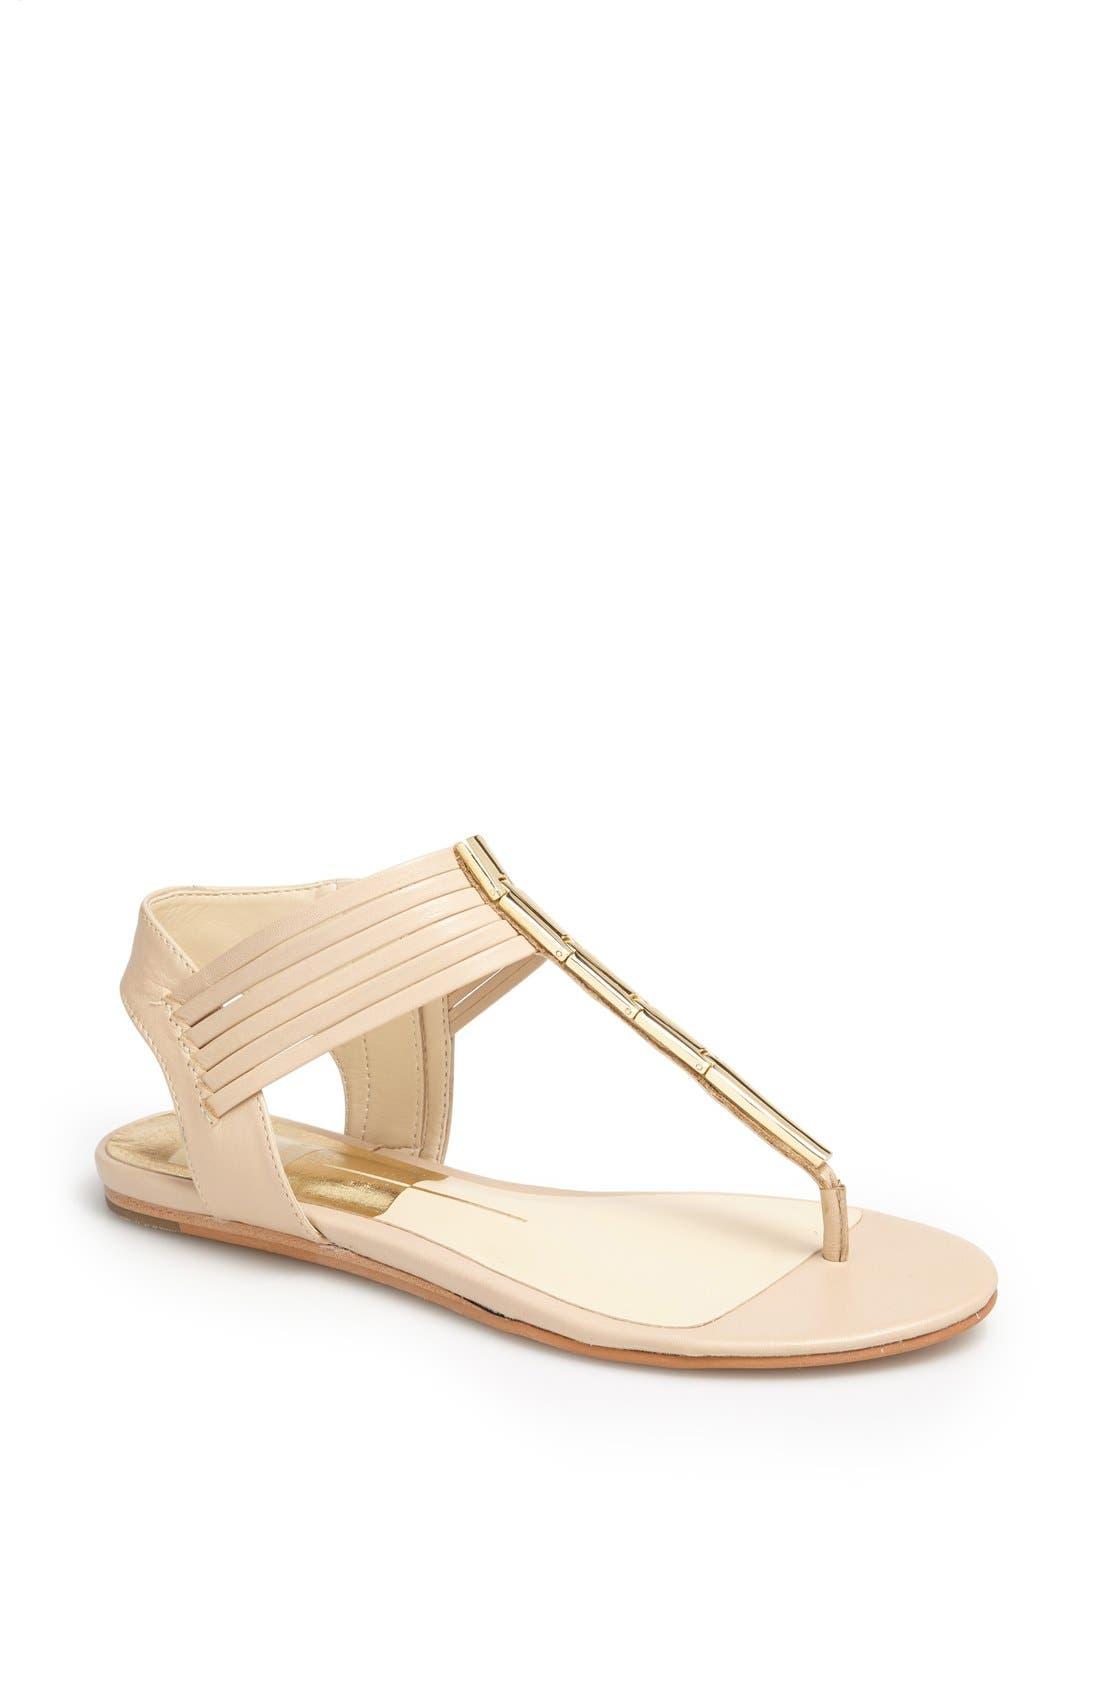 Main Image - Dolce Vita 'Amala' Sandal